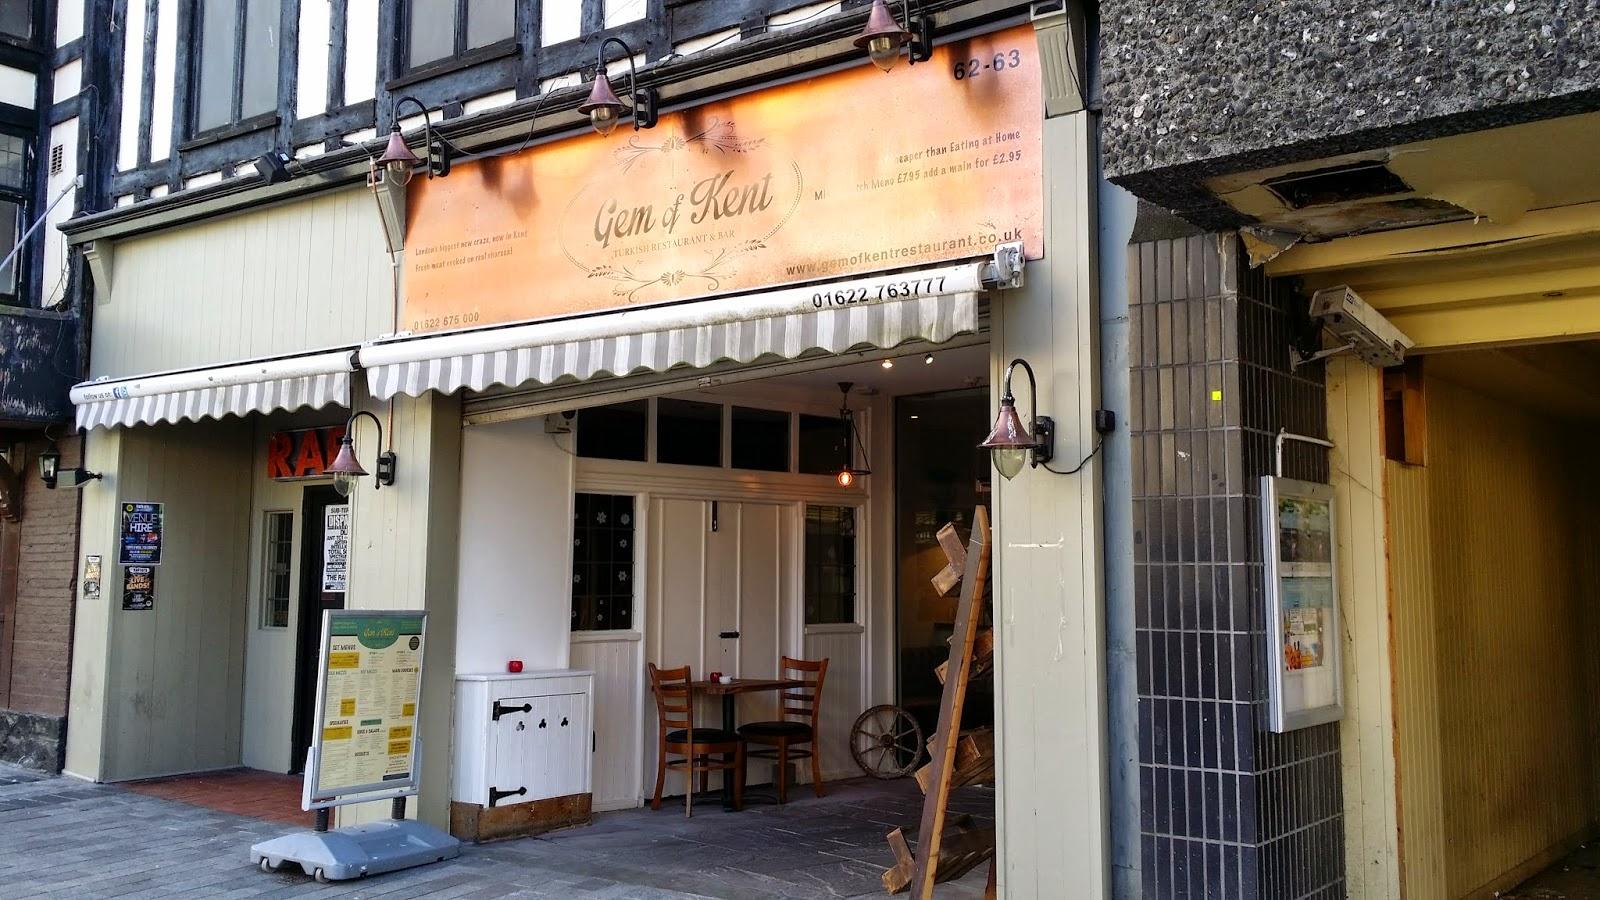 High Street Radio Cafe